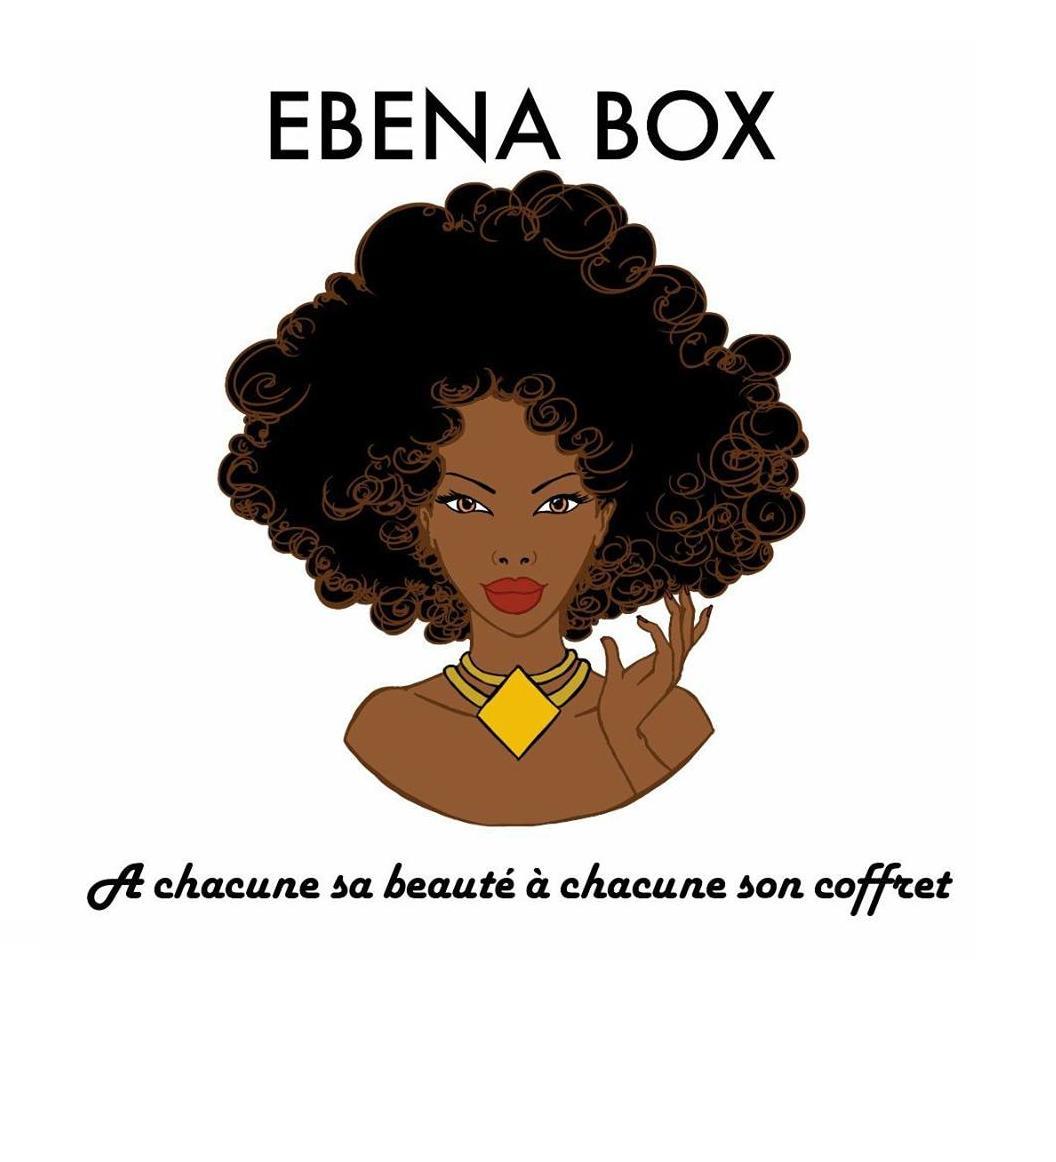 Ebena box